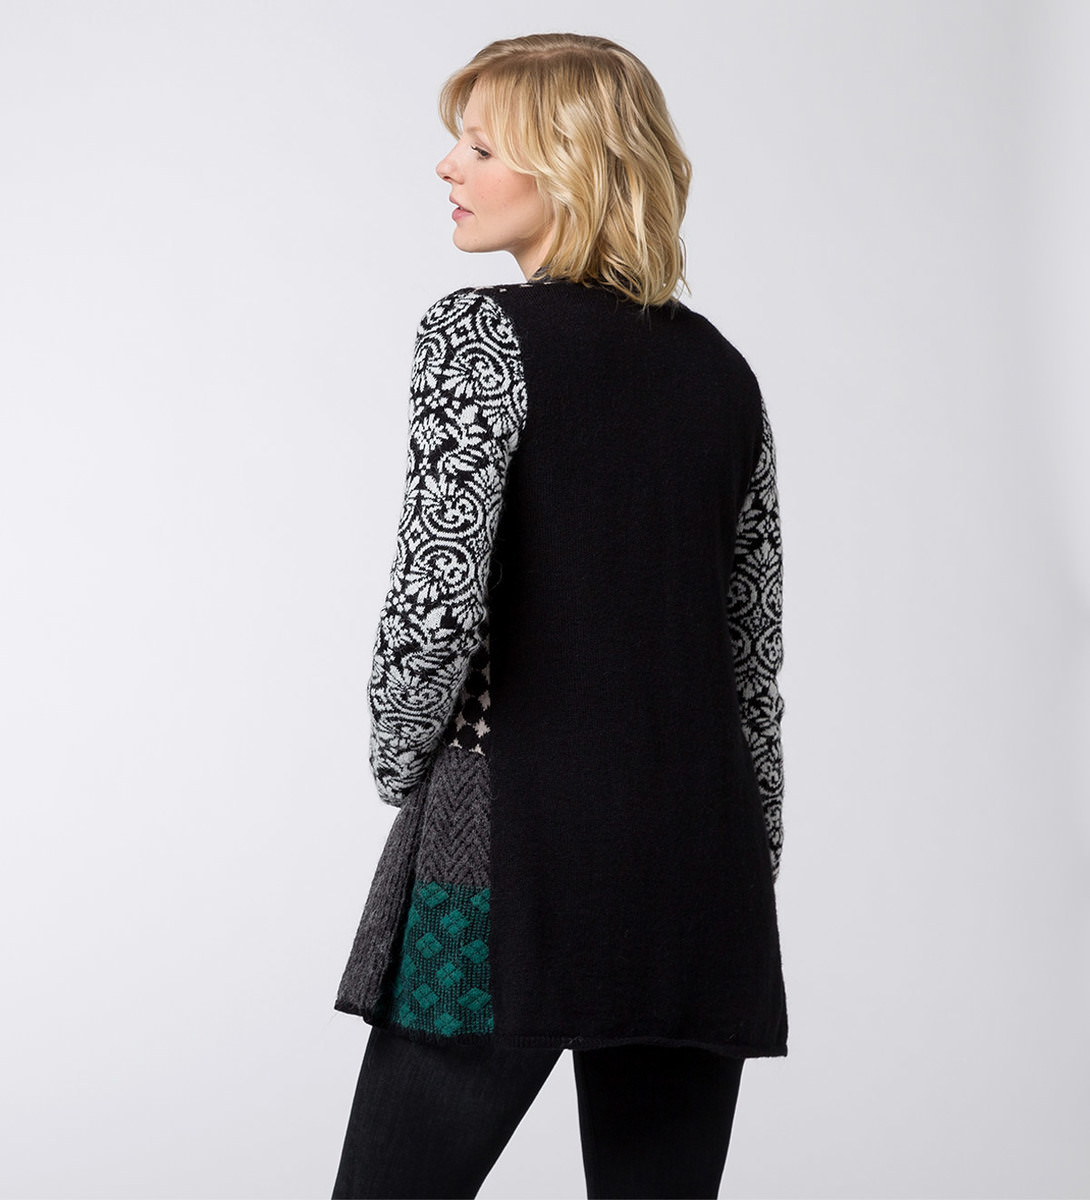 Strickjacke mit Patchwork-Muster in black